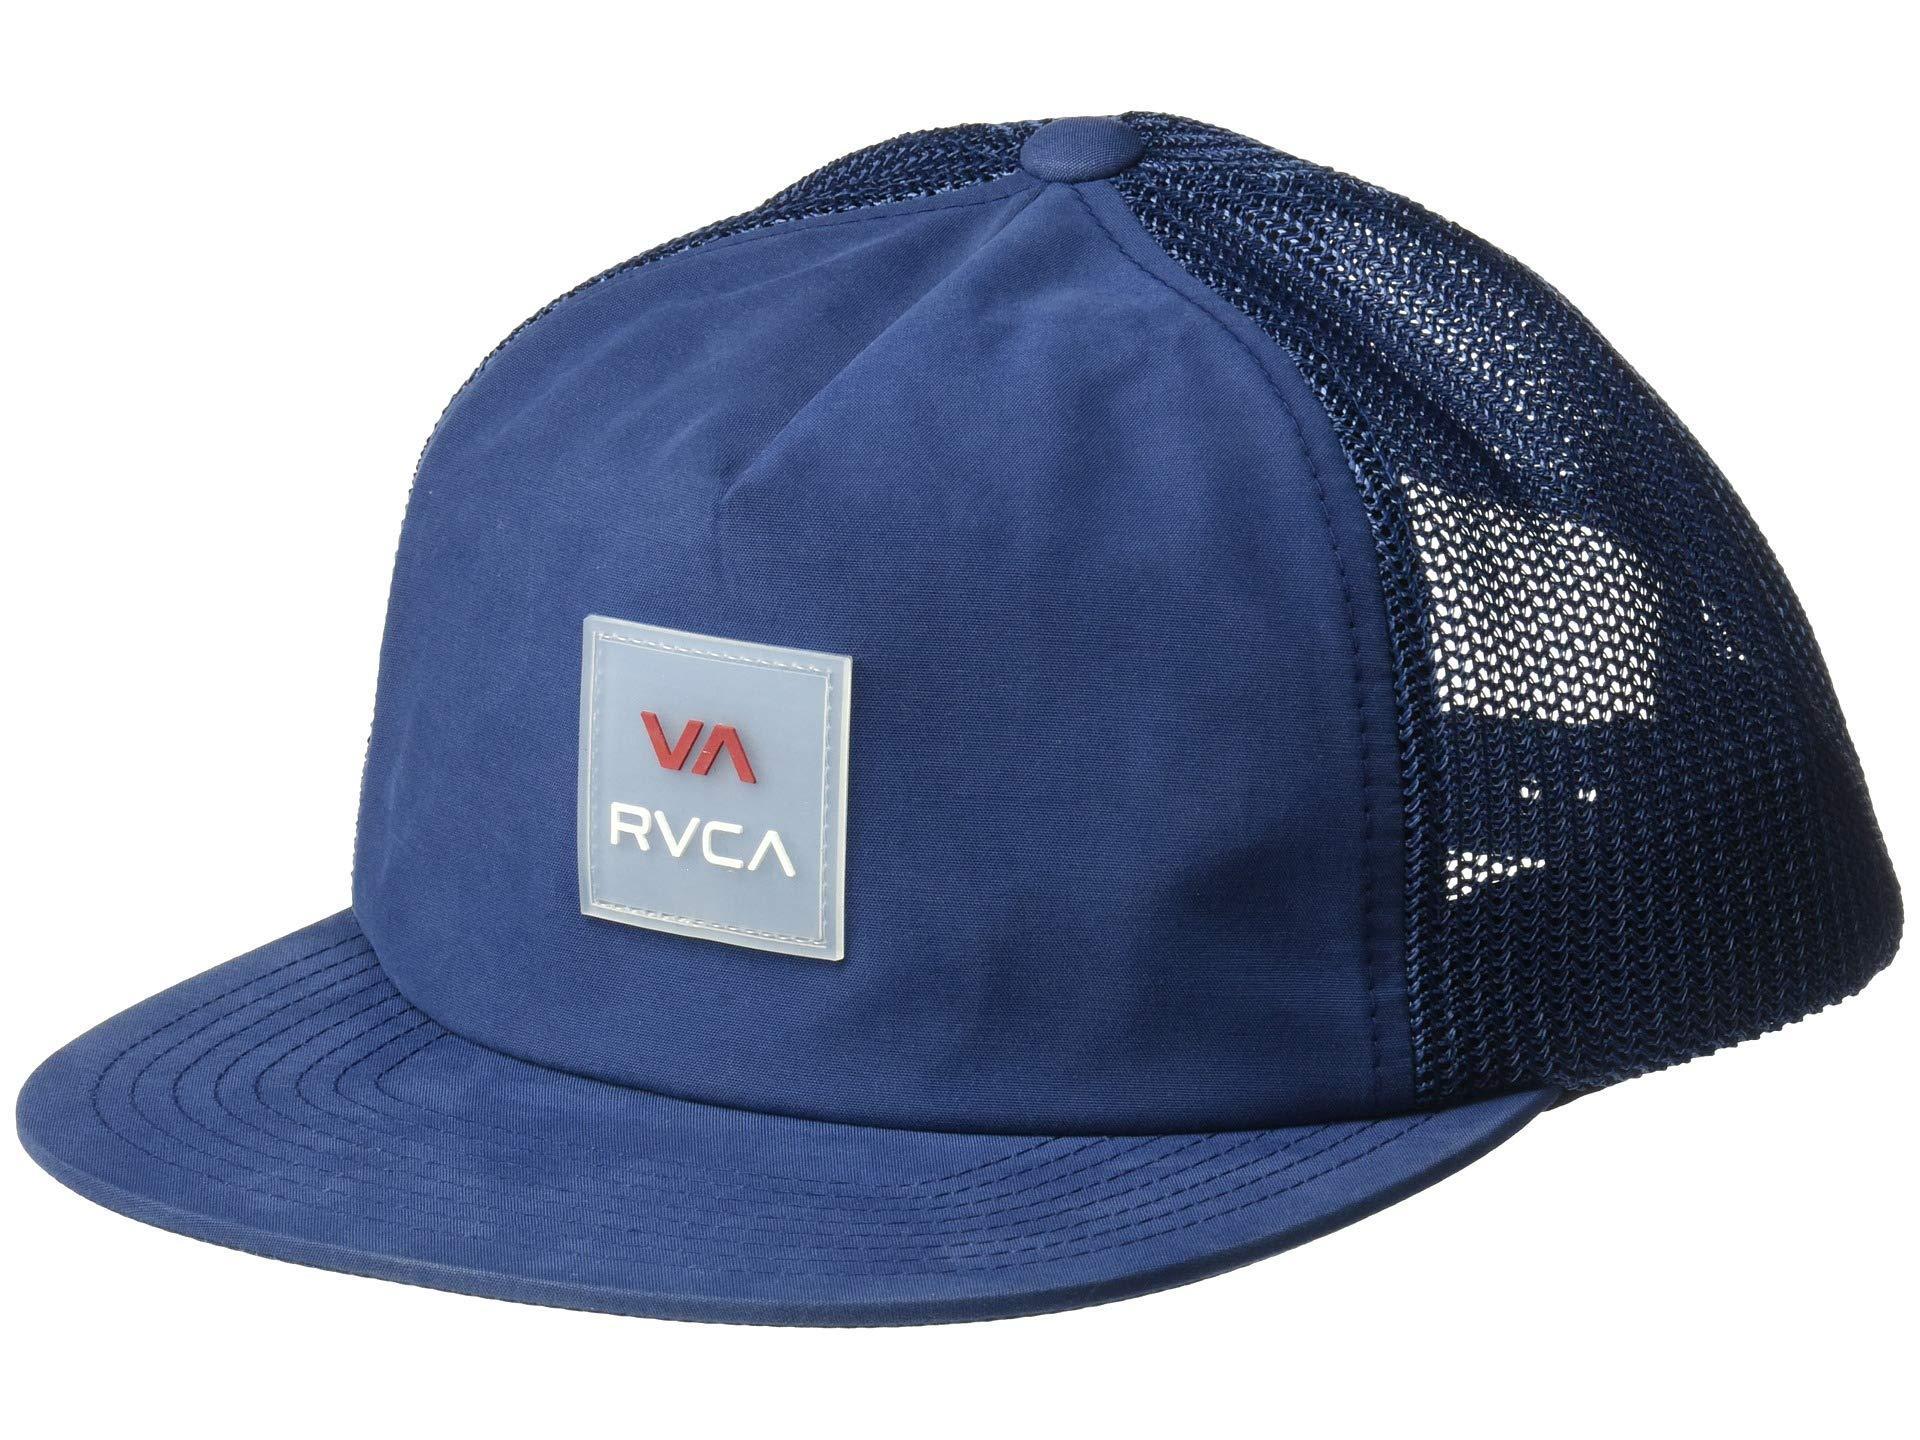 new arrival 9edd6 56b2e RVCA - Blue Va All The Way Trucker (dark Navy) Caps for Men -. View  fullscreen